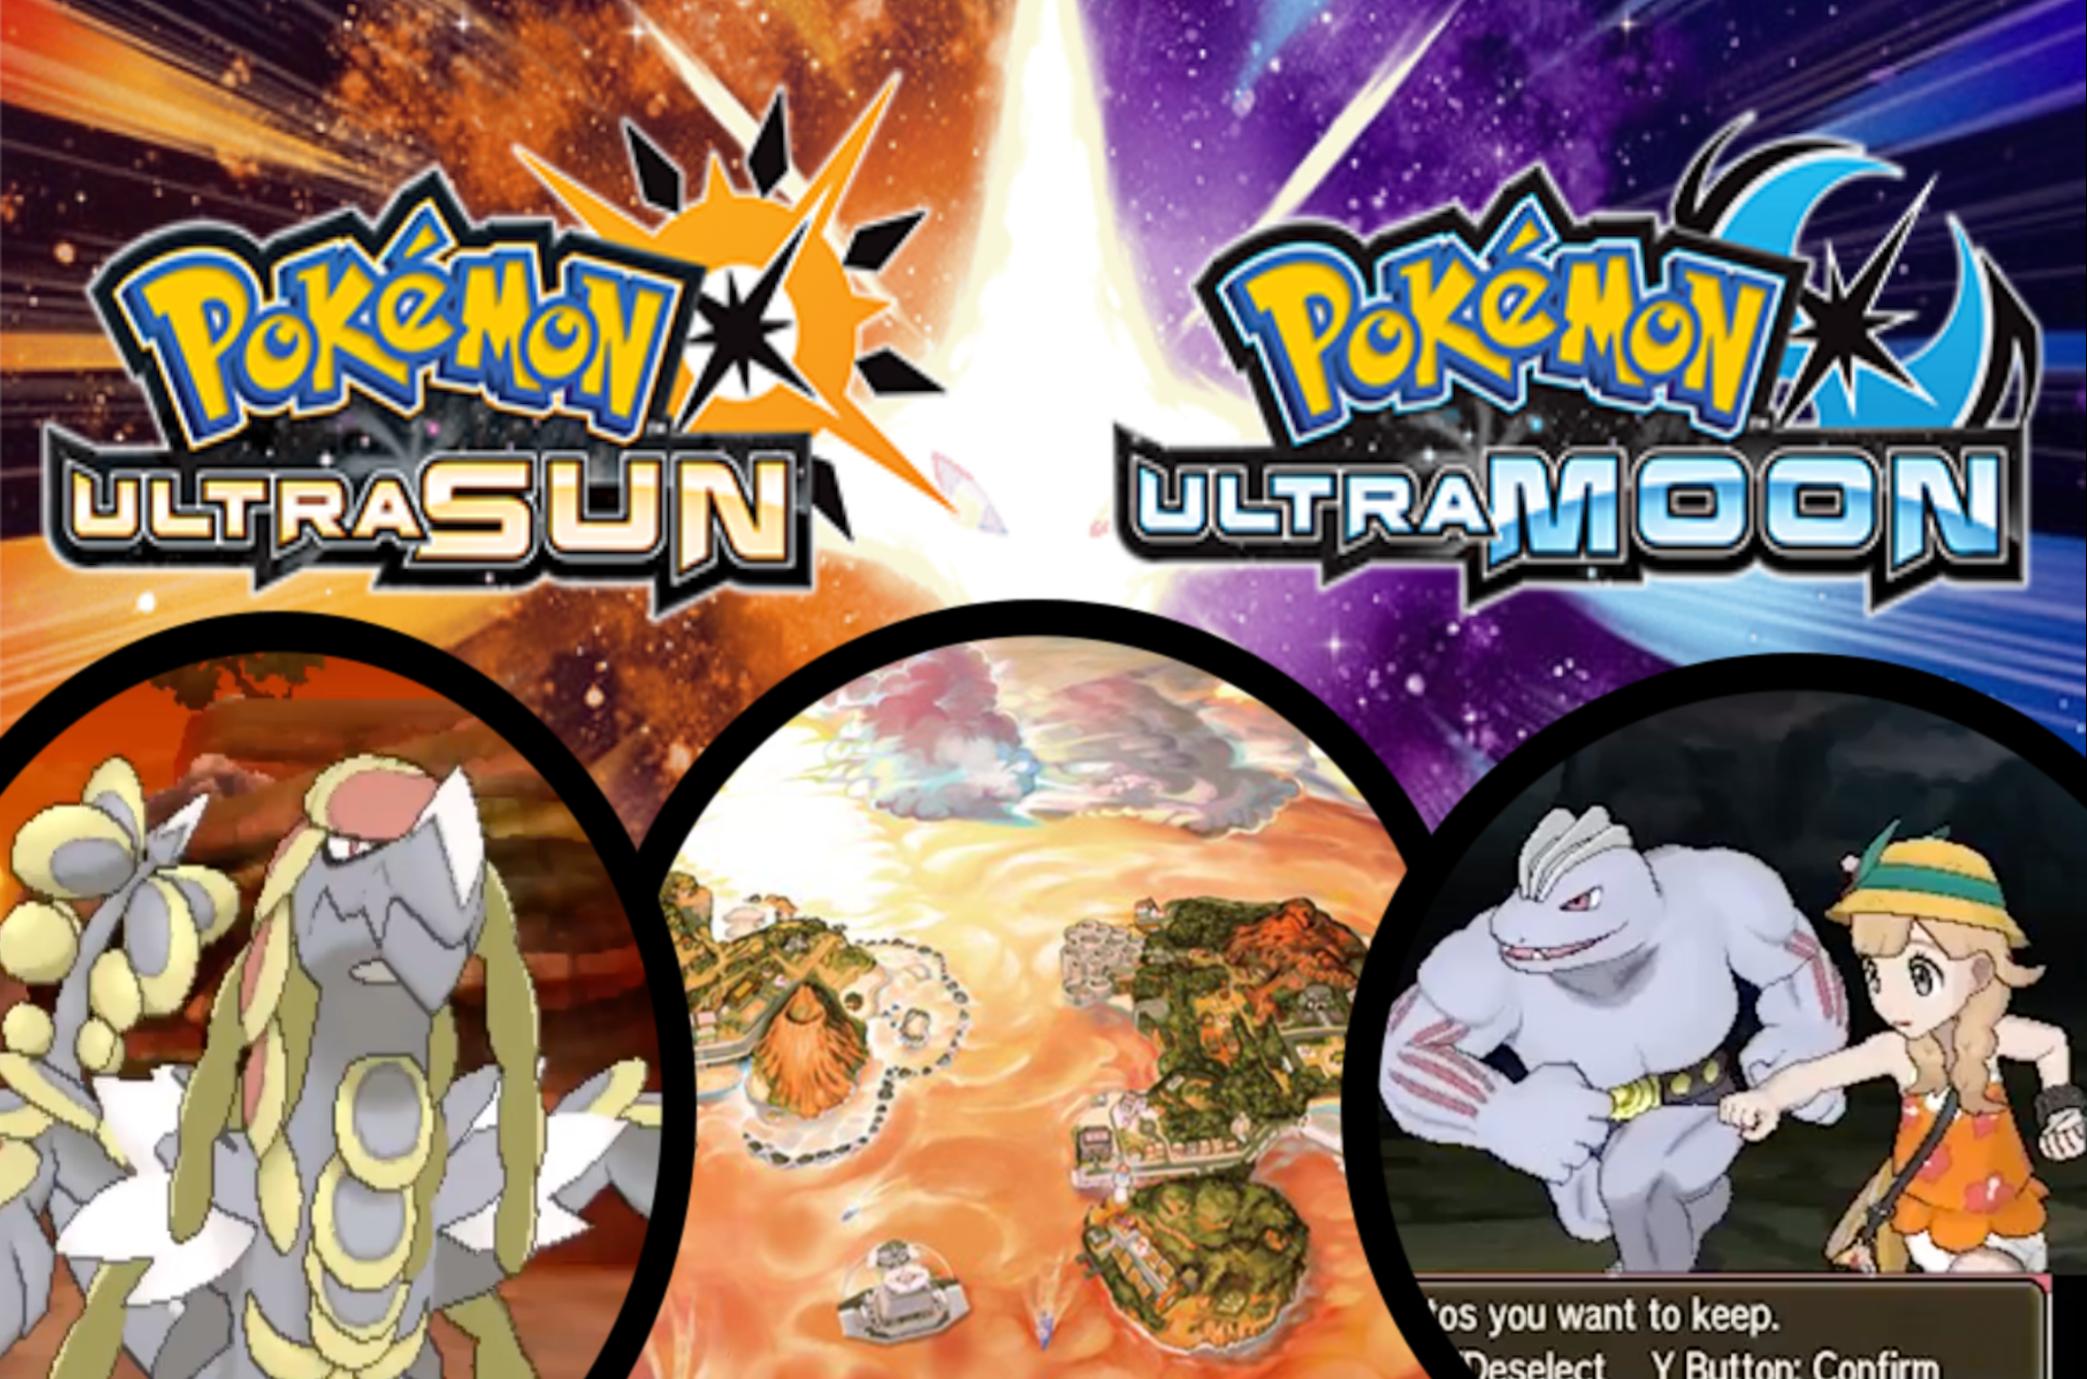 Pokémon Ultra Sun and Pokémon Ultra Moon | Video Games & Apps